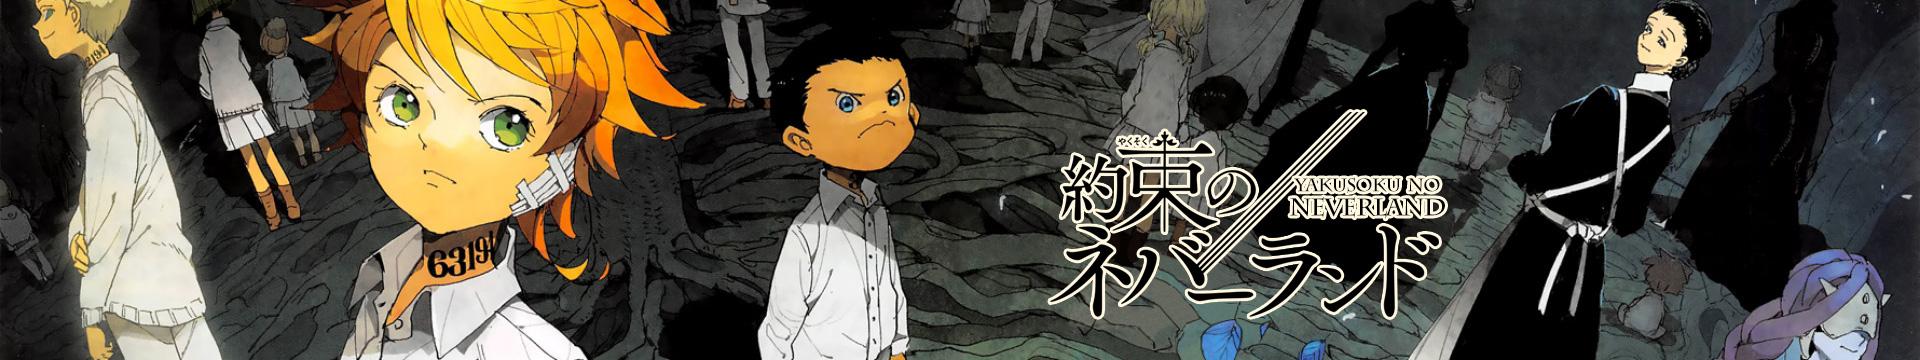 Yakusoku no Neverland